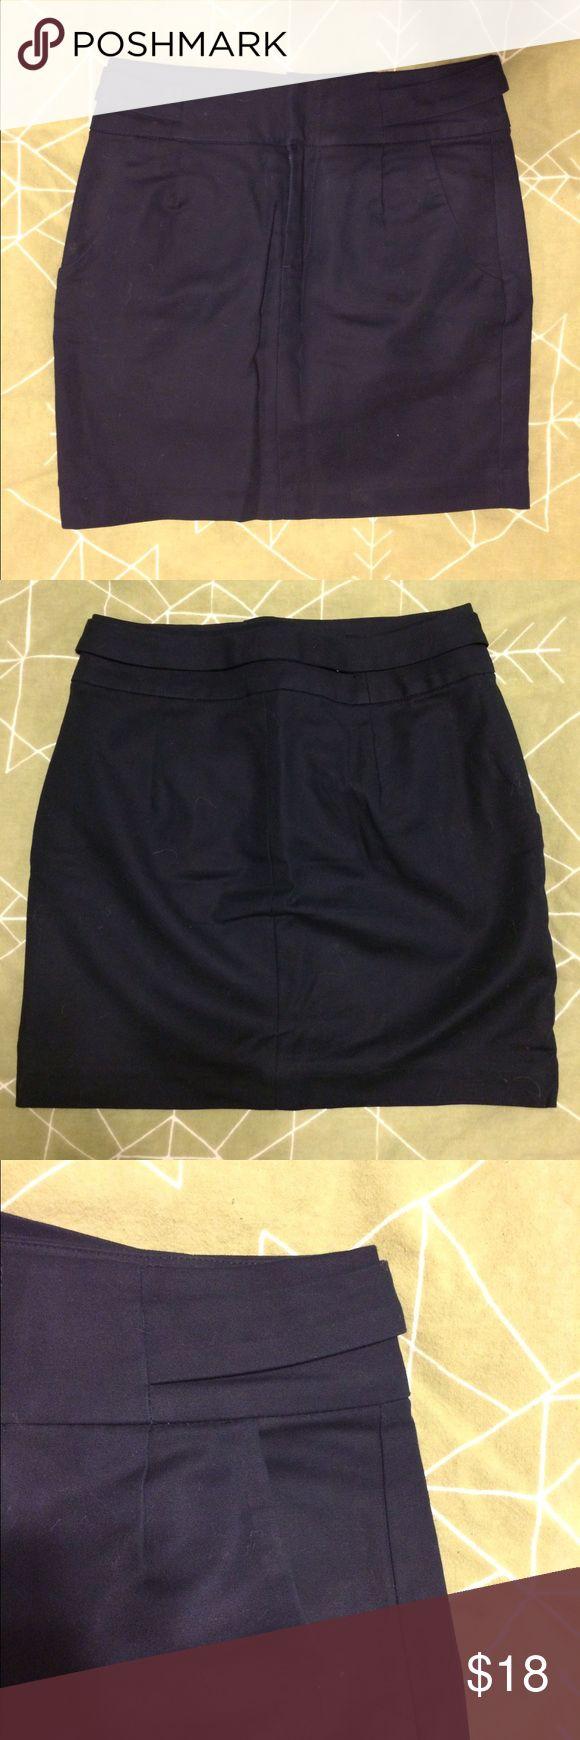 00P Banana Republic Skirt w/ belt and pockets 00P Banana Republic pencil Skirt w/ belt and pockets Banana Republic Skirts Pencil